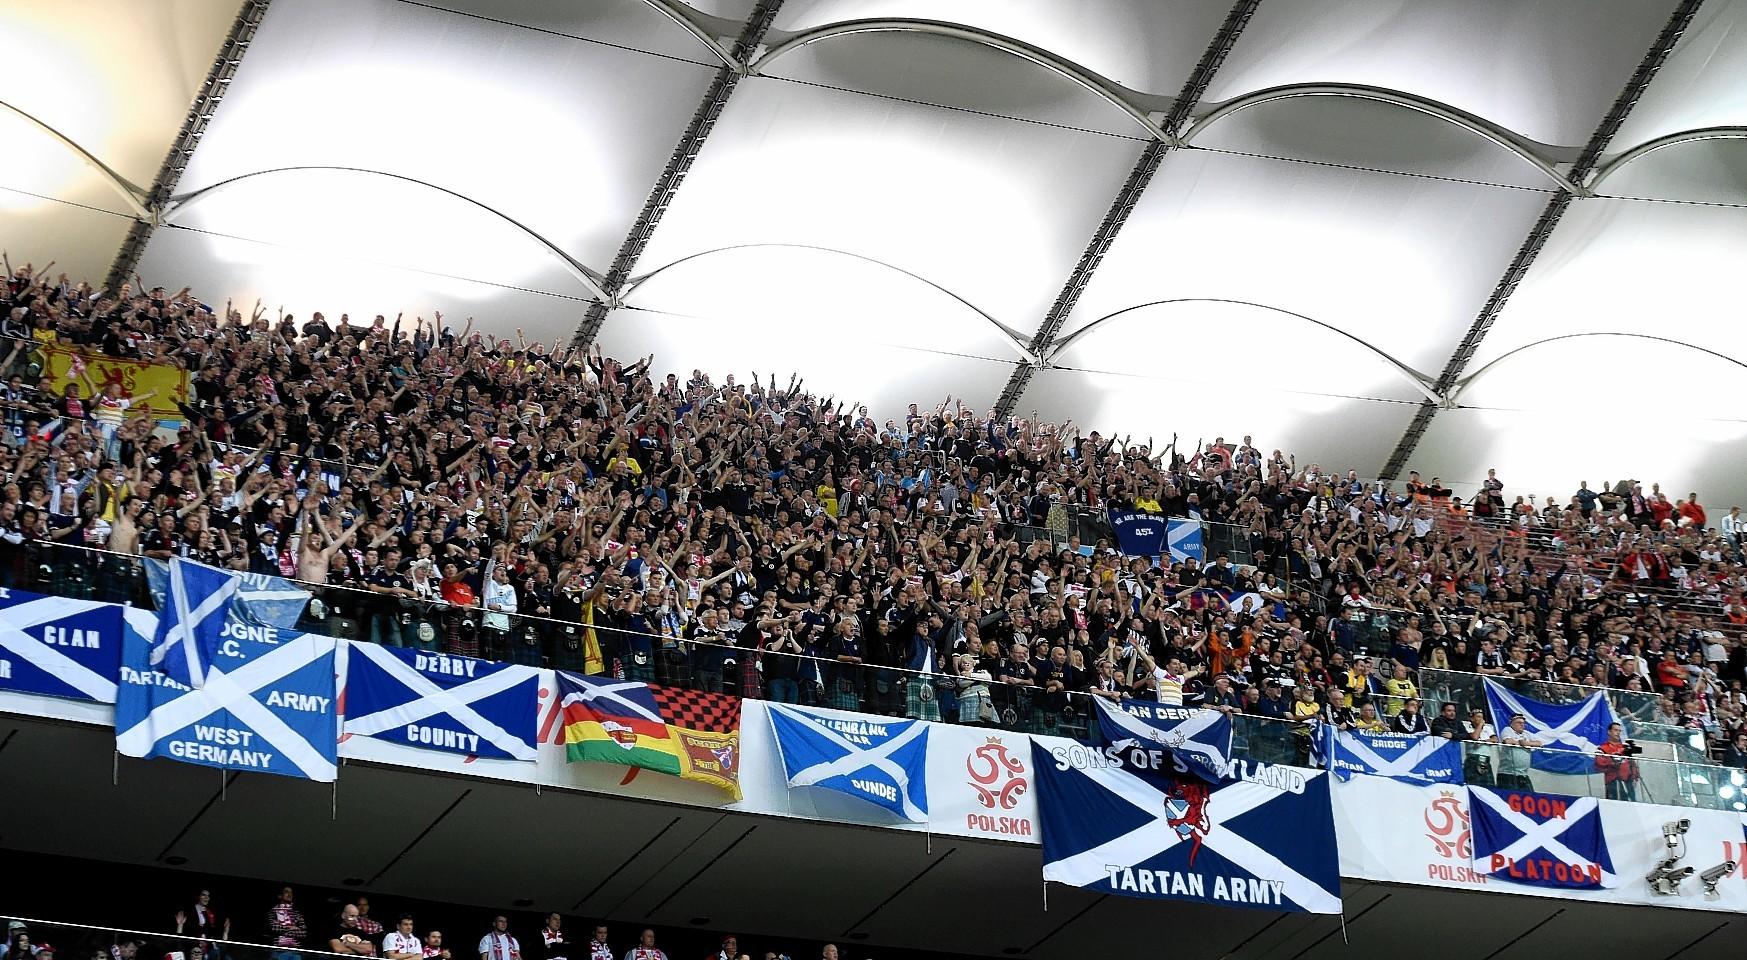 The Tartan Army in the Polish National Stadium on Tuesday night